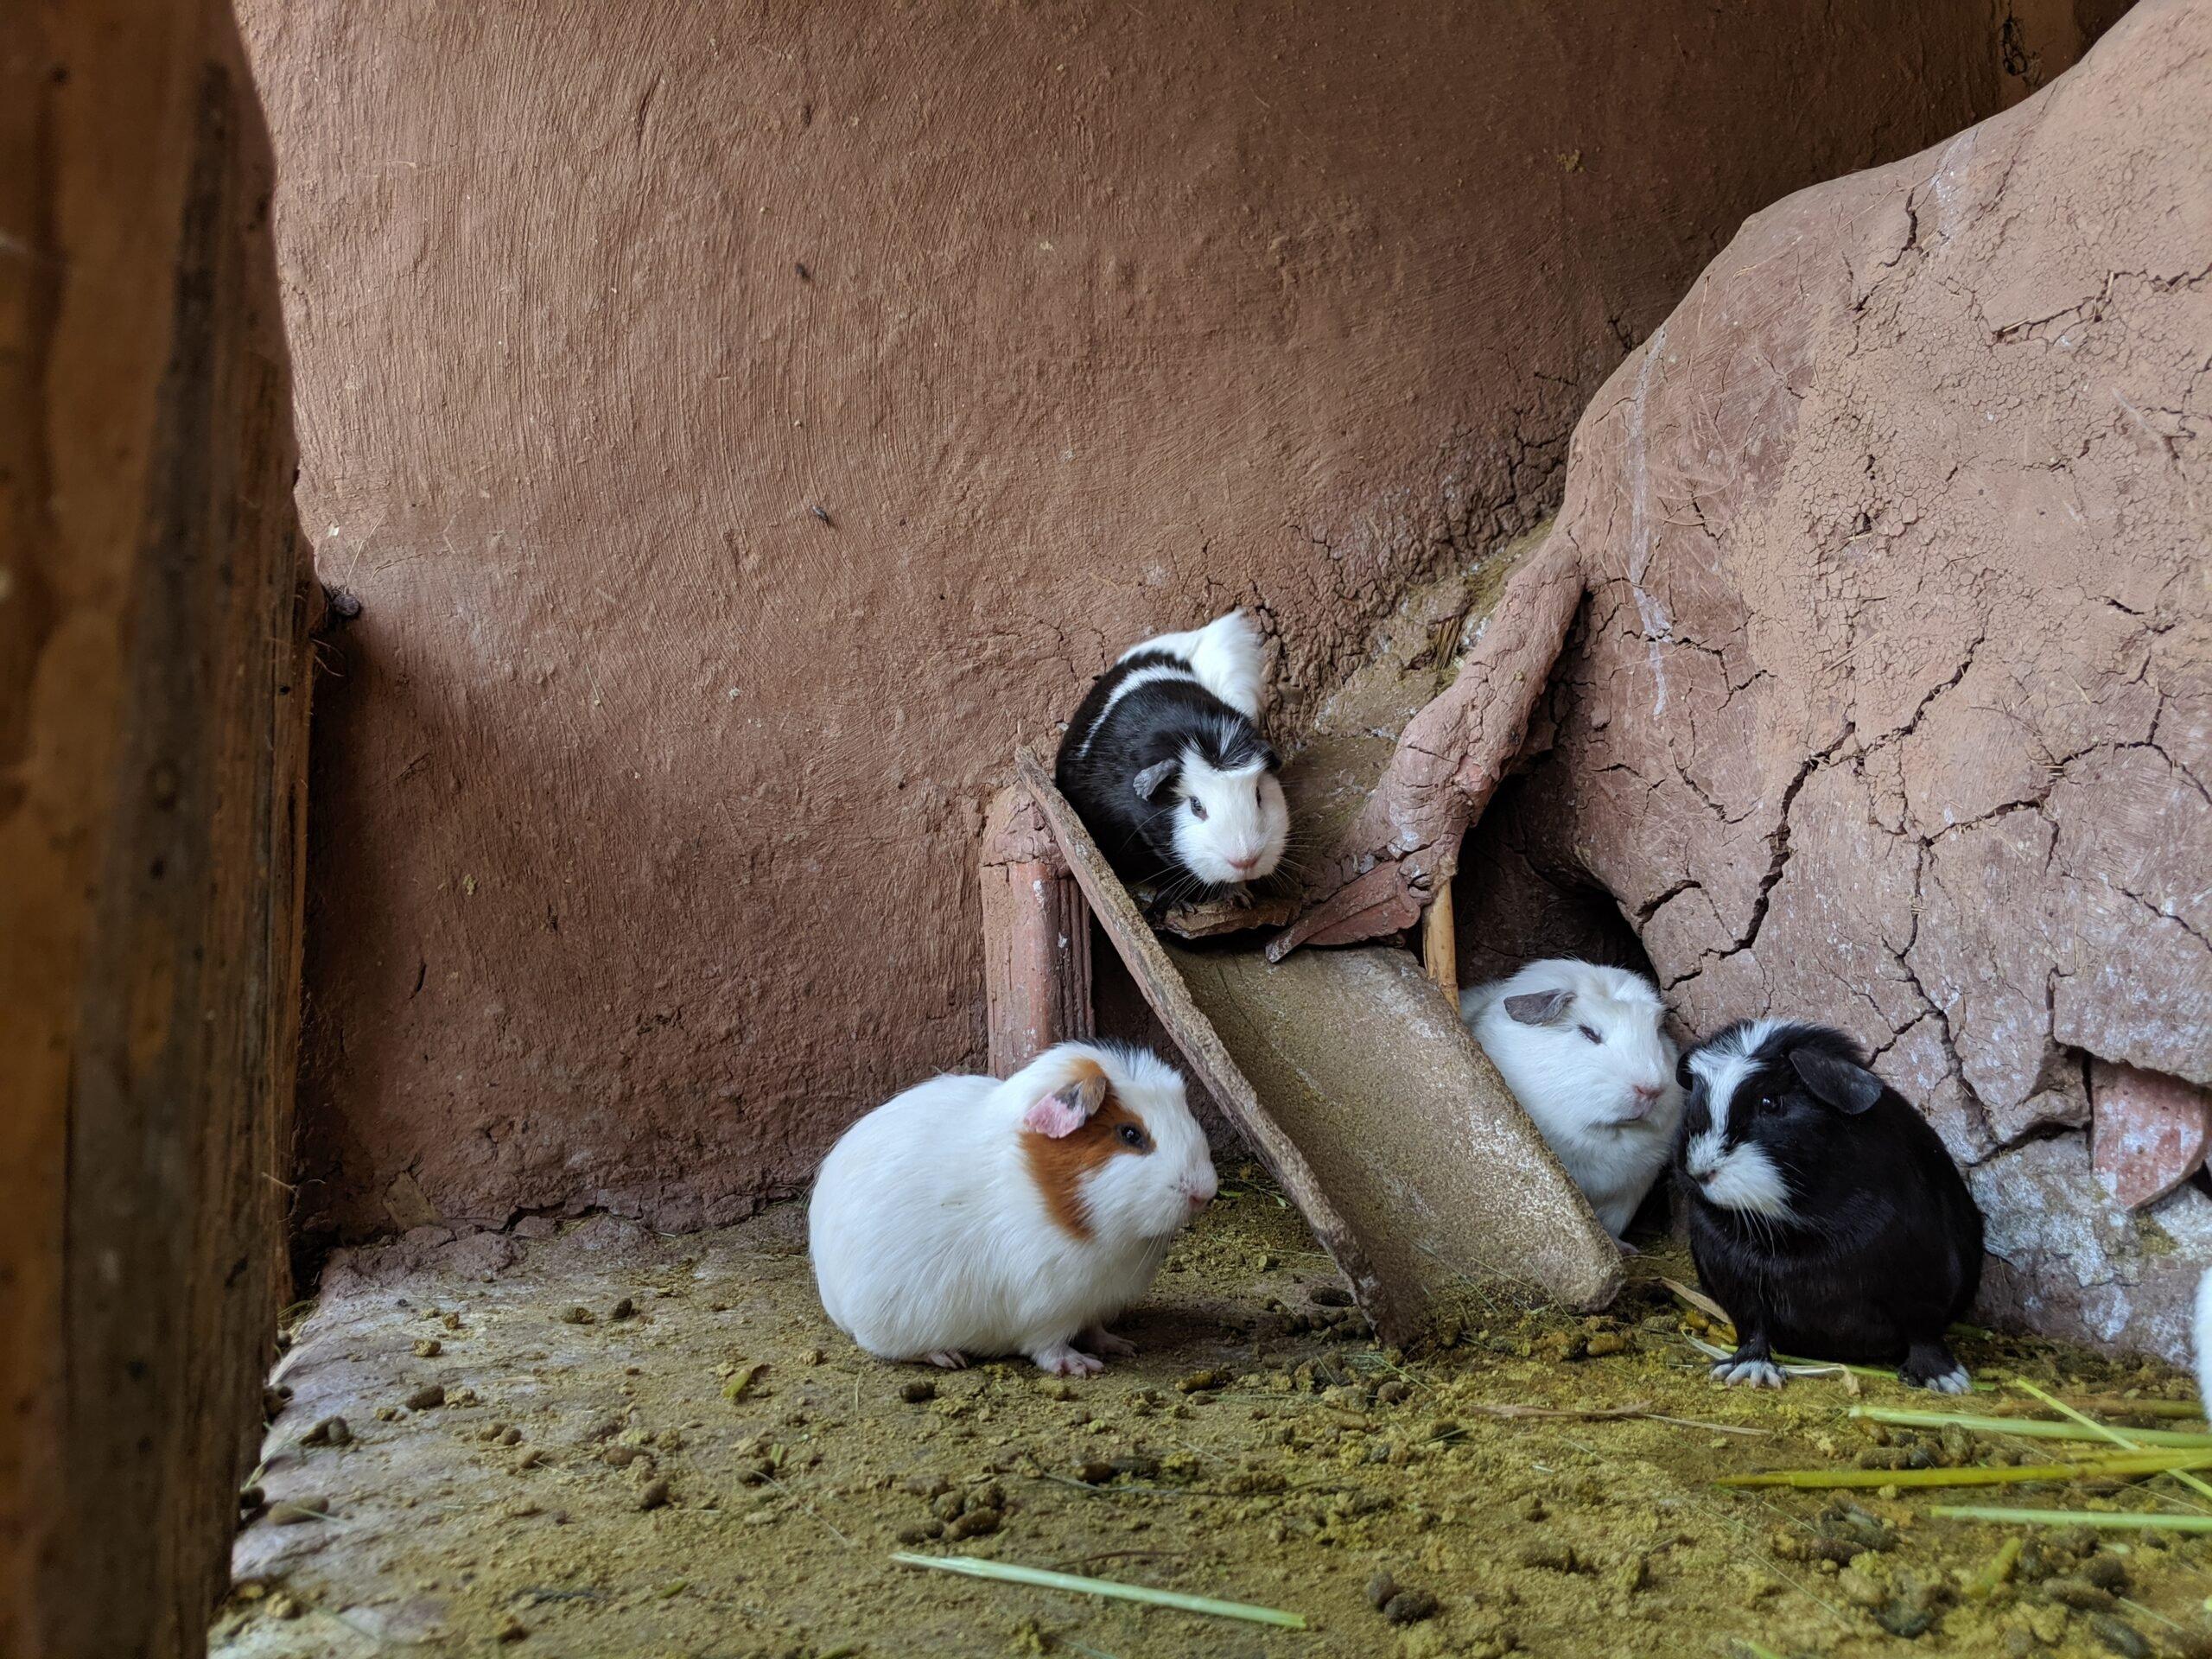 Guinea pigs on display in an enclosure in peru.